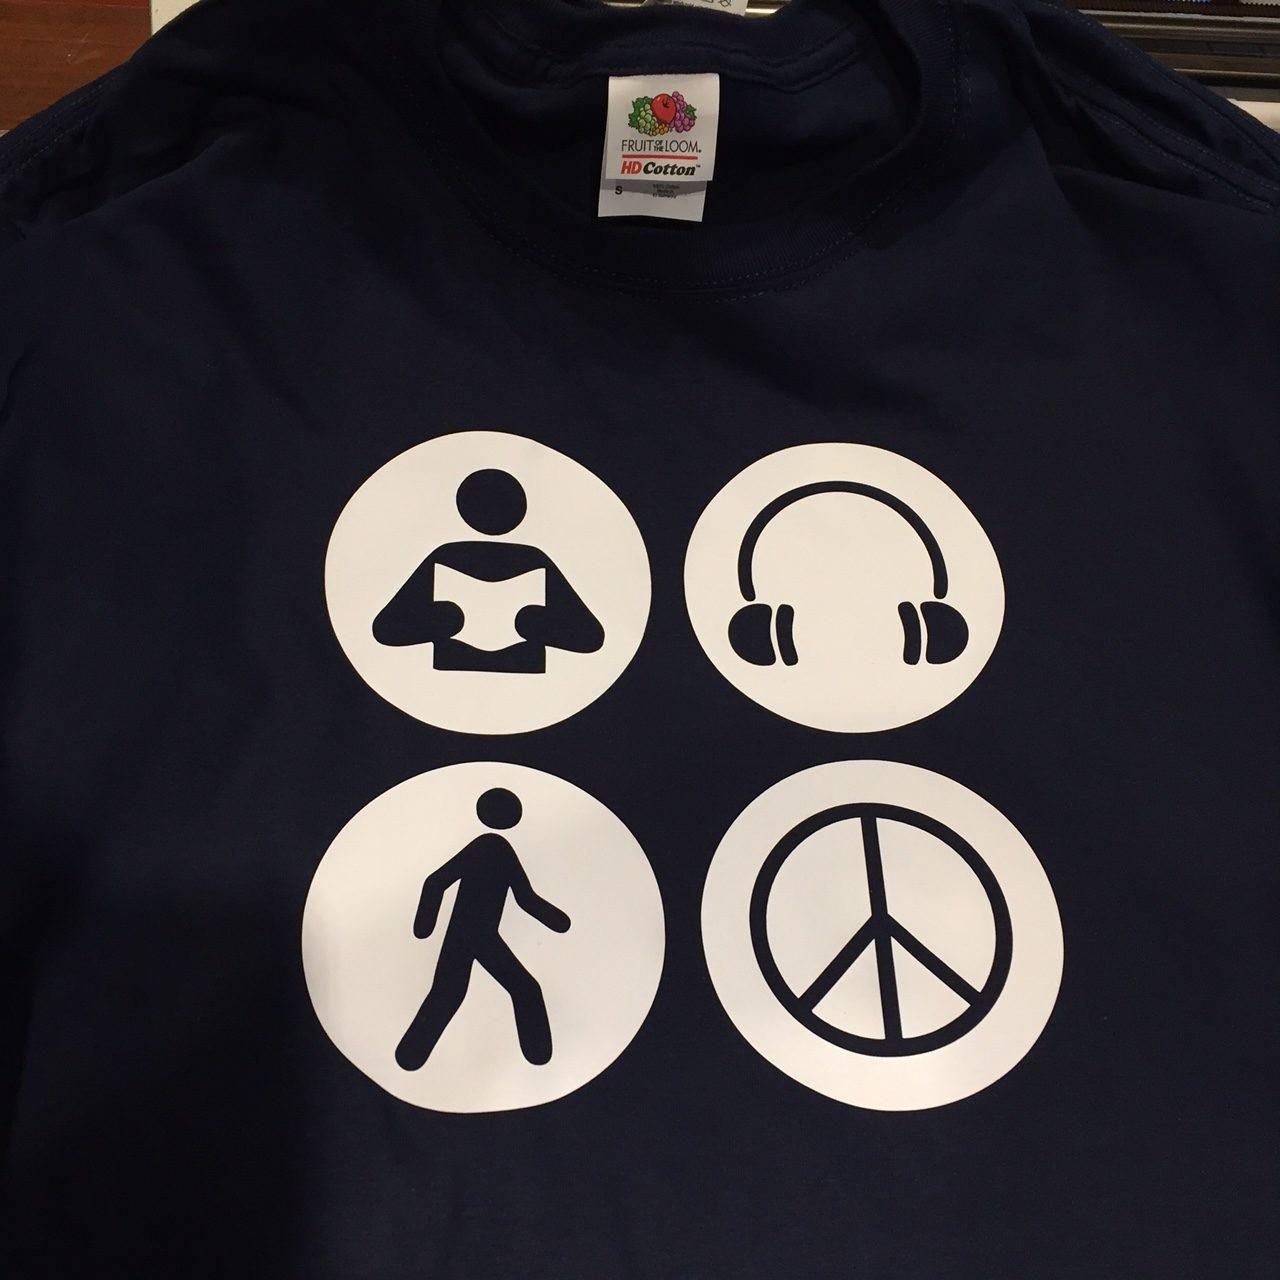 IMG 3292 e1512768885805 First 2018 Mutual Theme T-Shirts